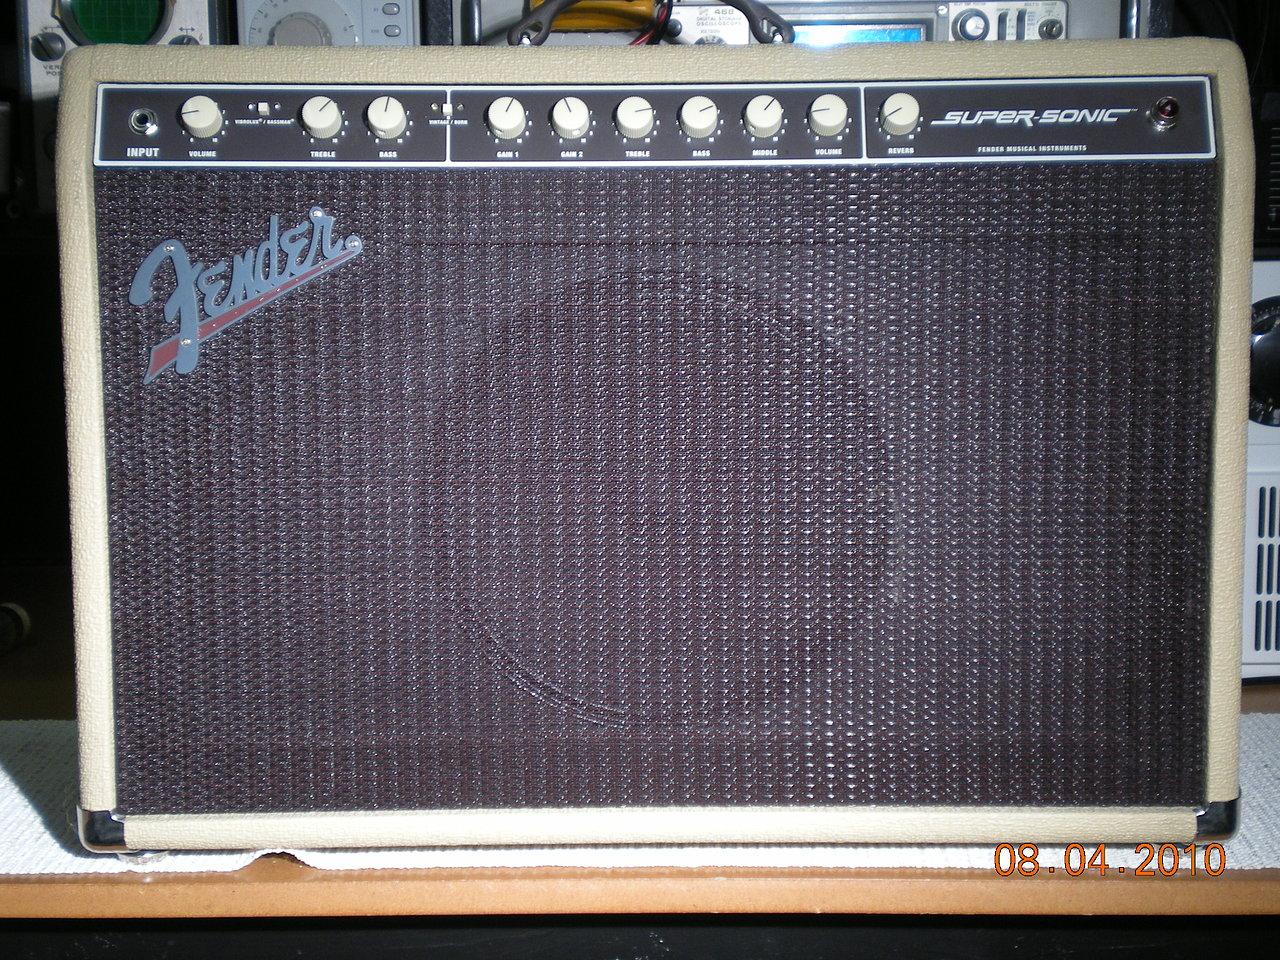 Fender+Super+Sonic+repair.JPG